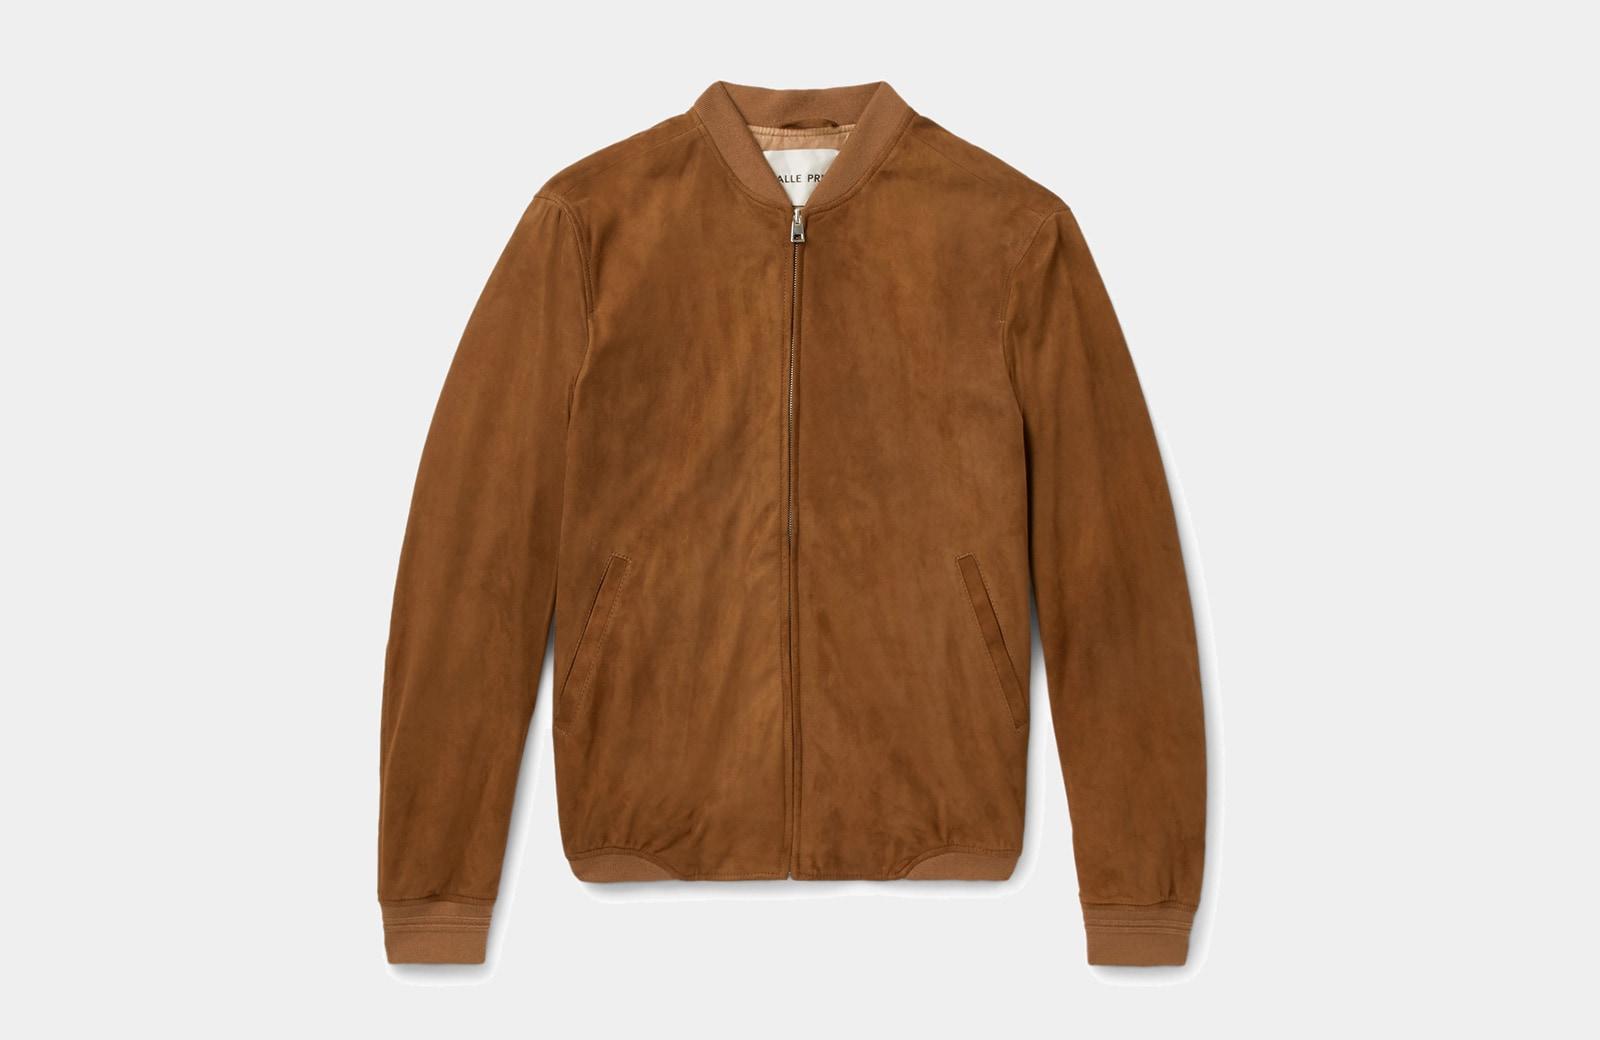 best tan bomber jacket men Salle Privee luxury style - Luxe Digital